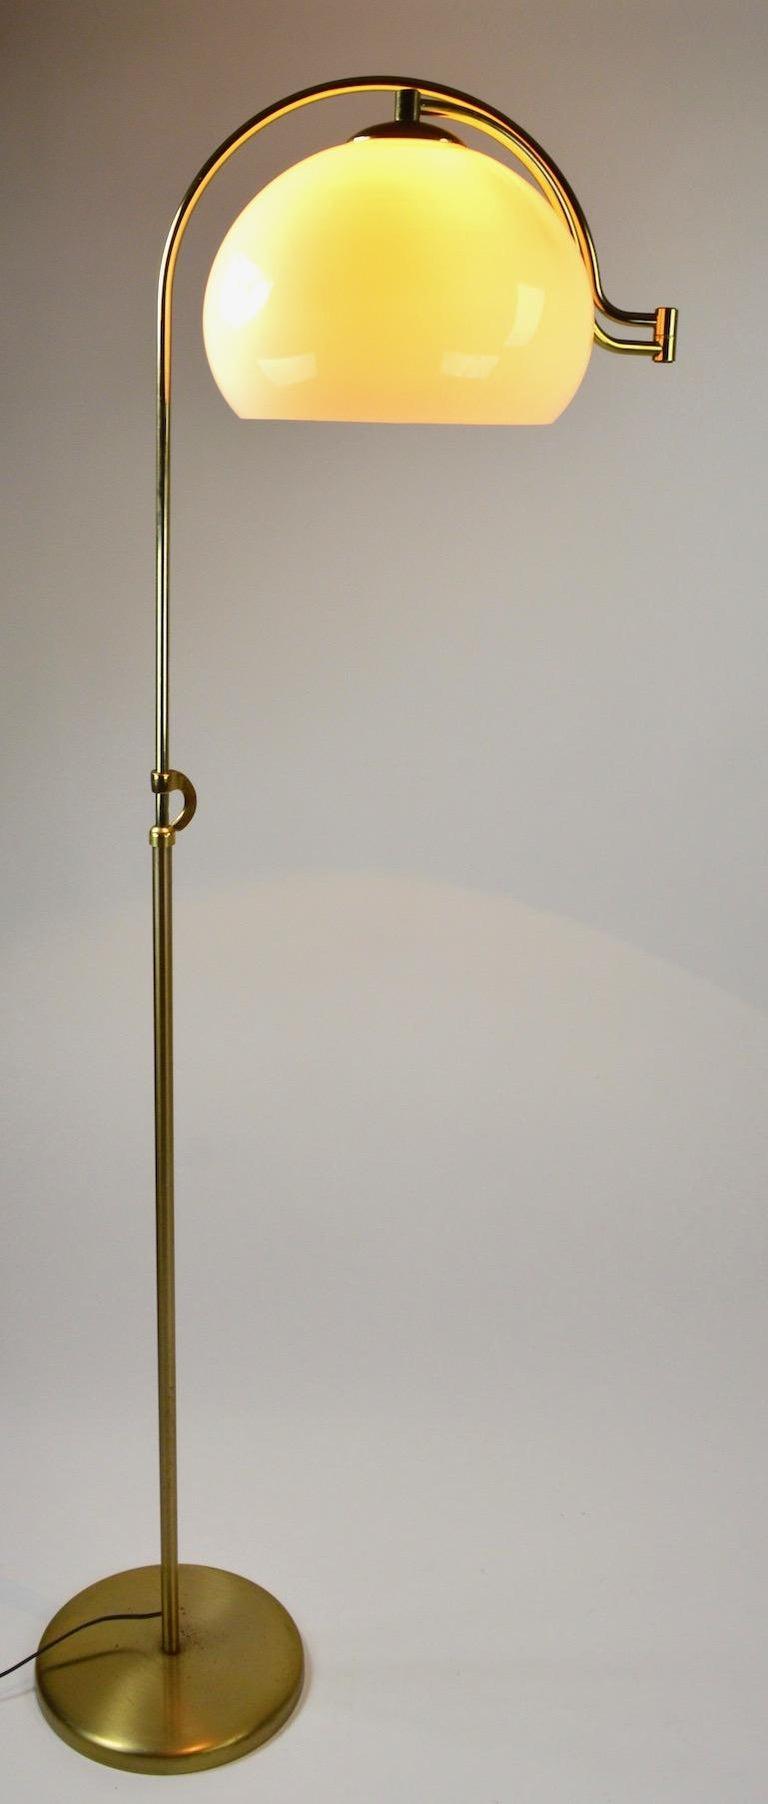 Mid-Century Modern Adjustable Swing Arm Floor Lamp by Laurel For Sale